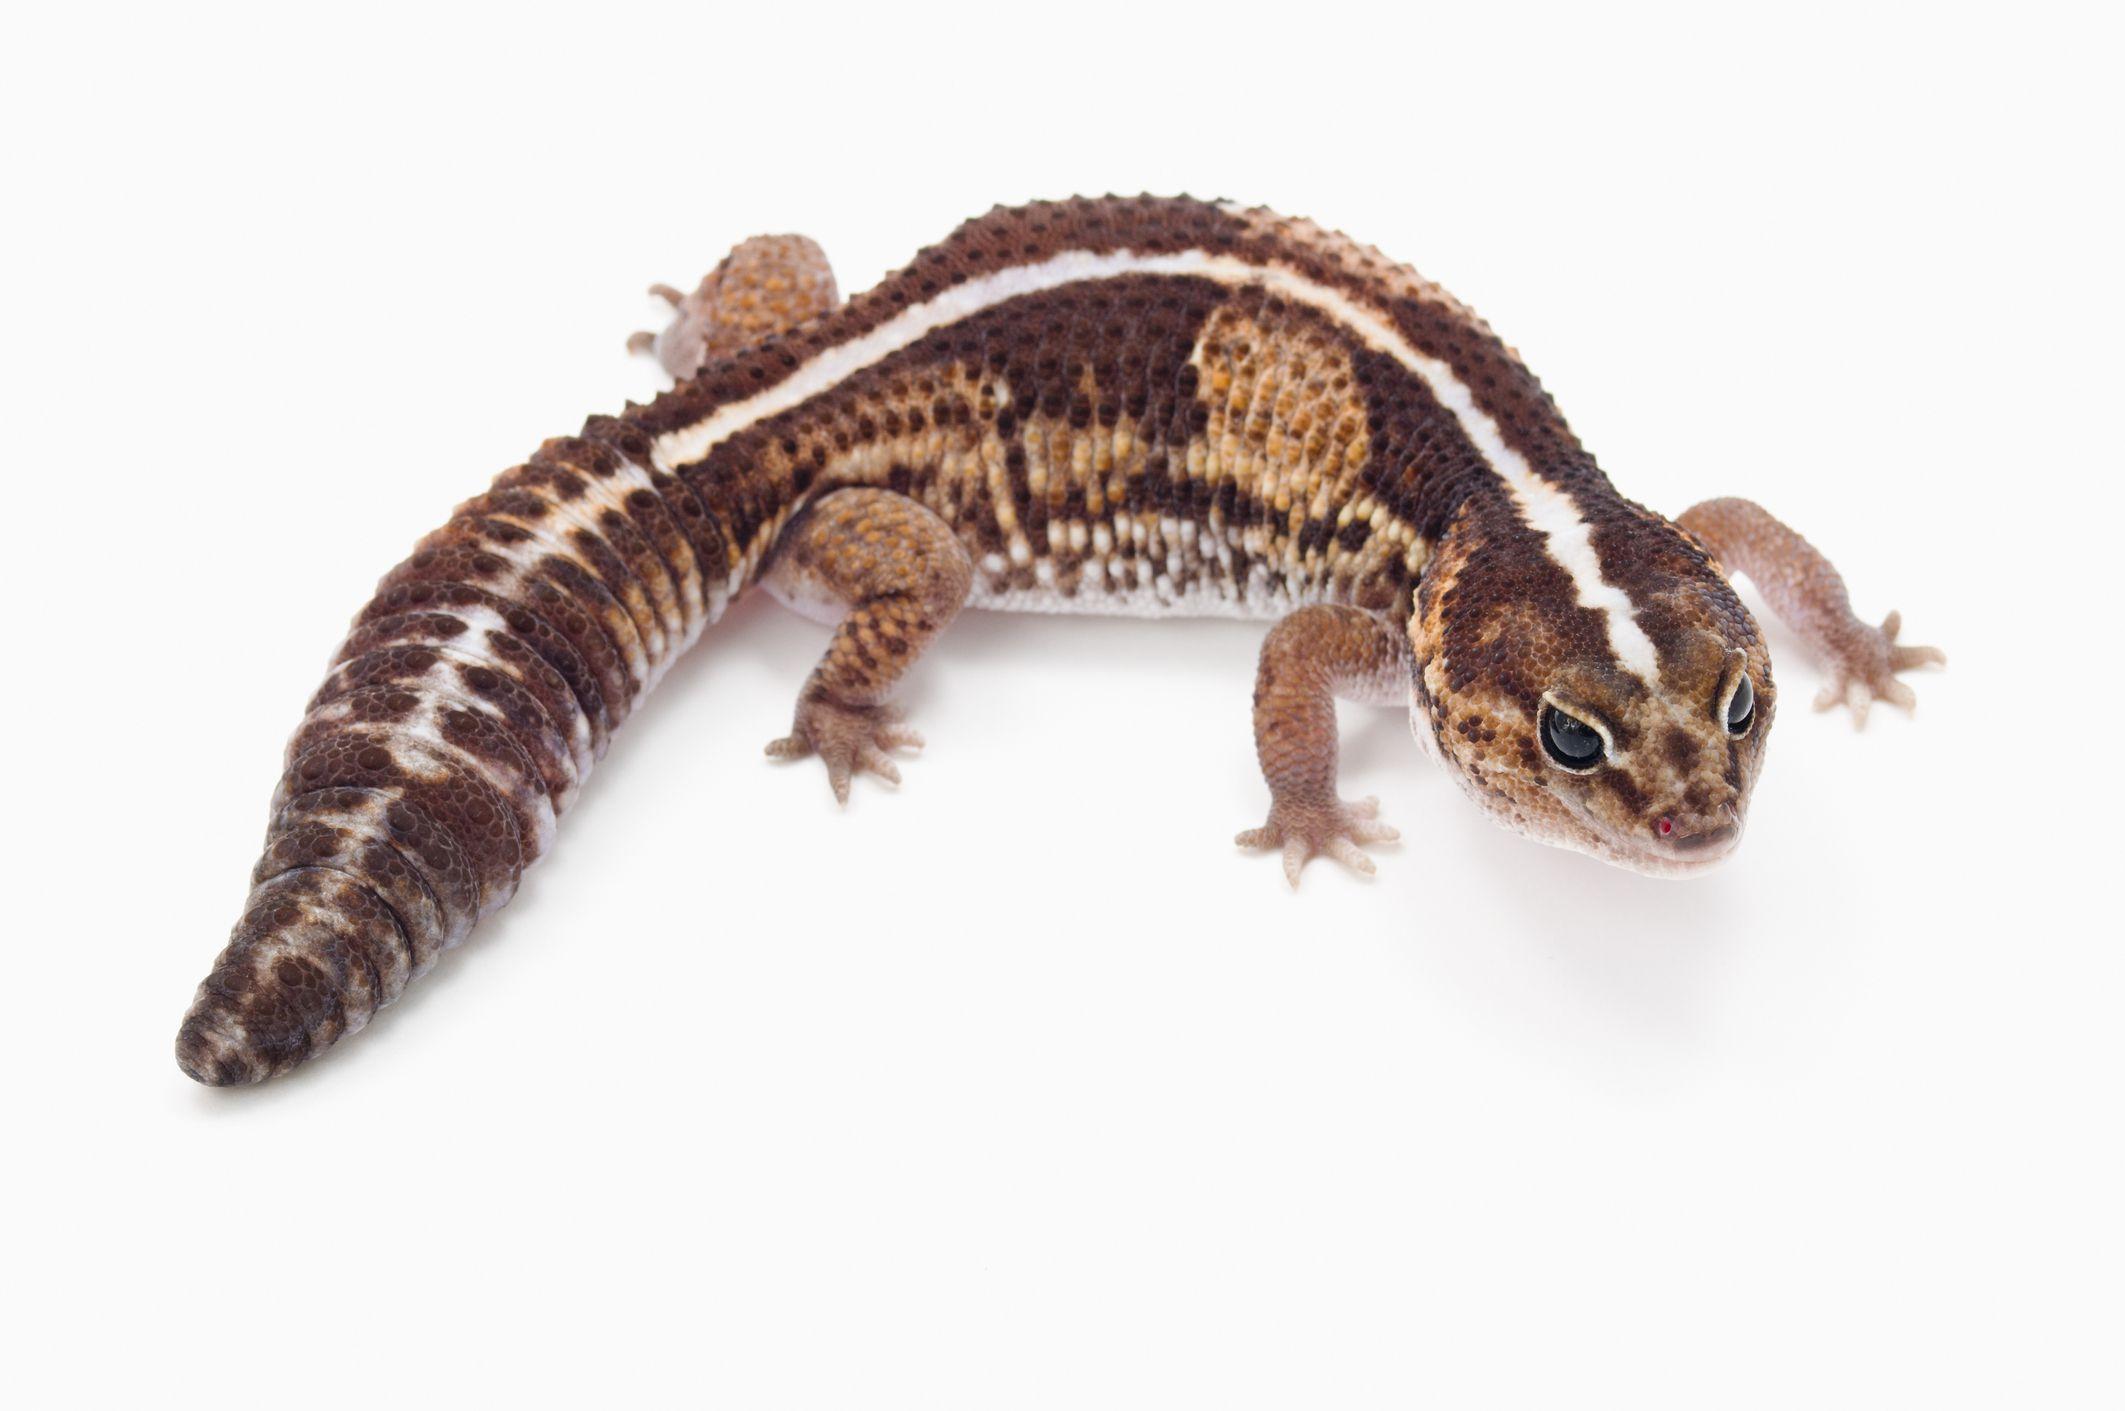 Gecko de cola gorda africana